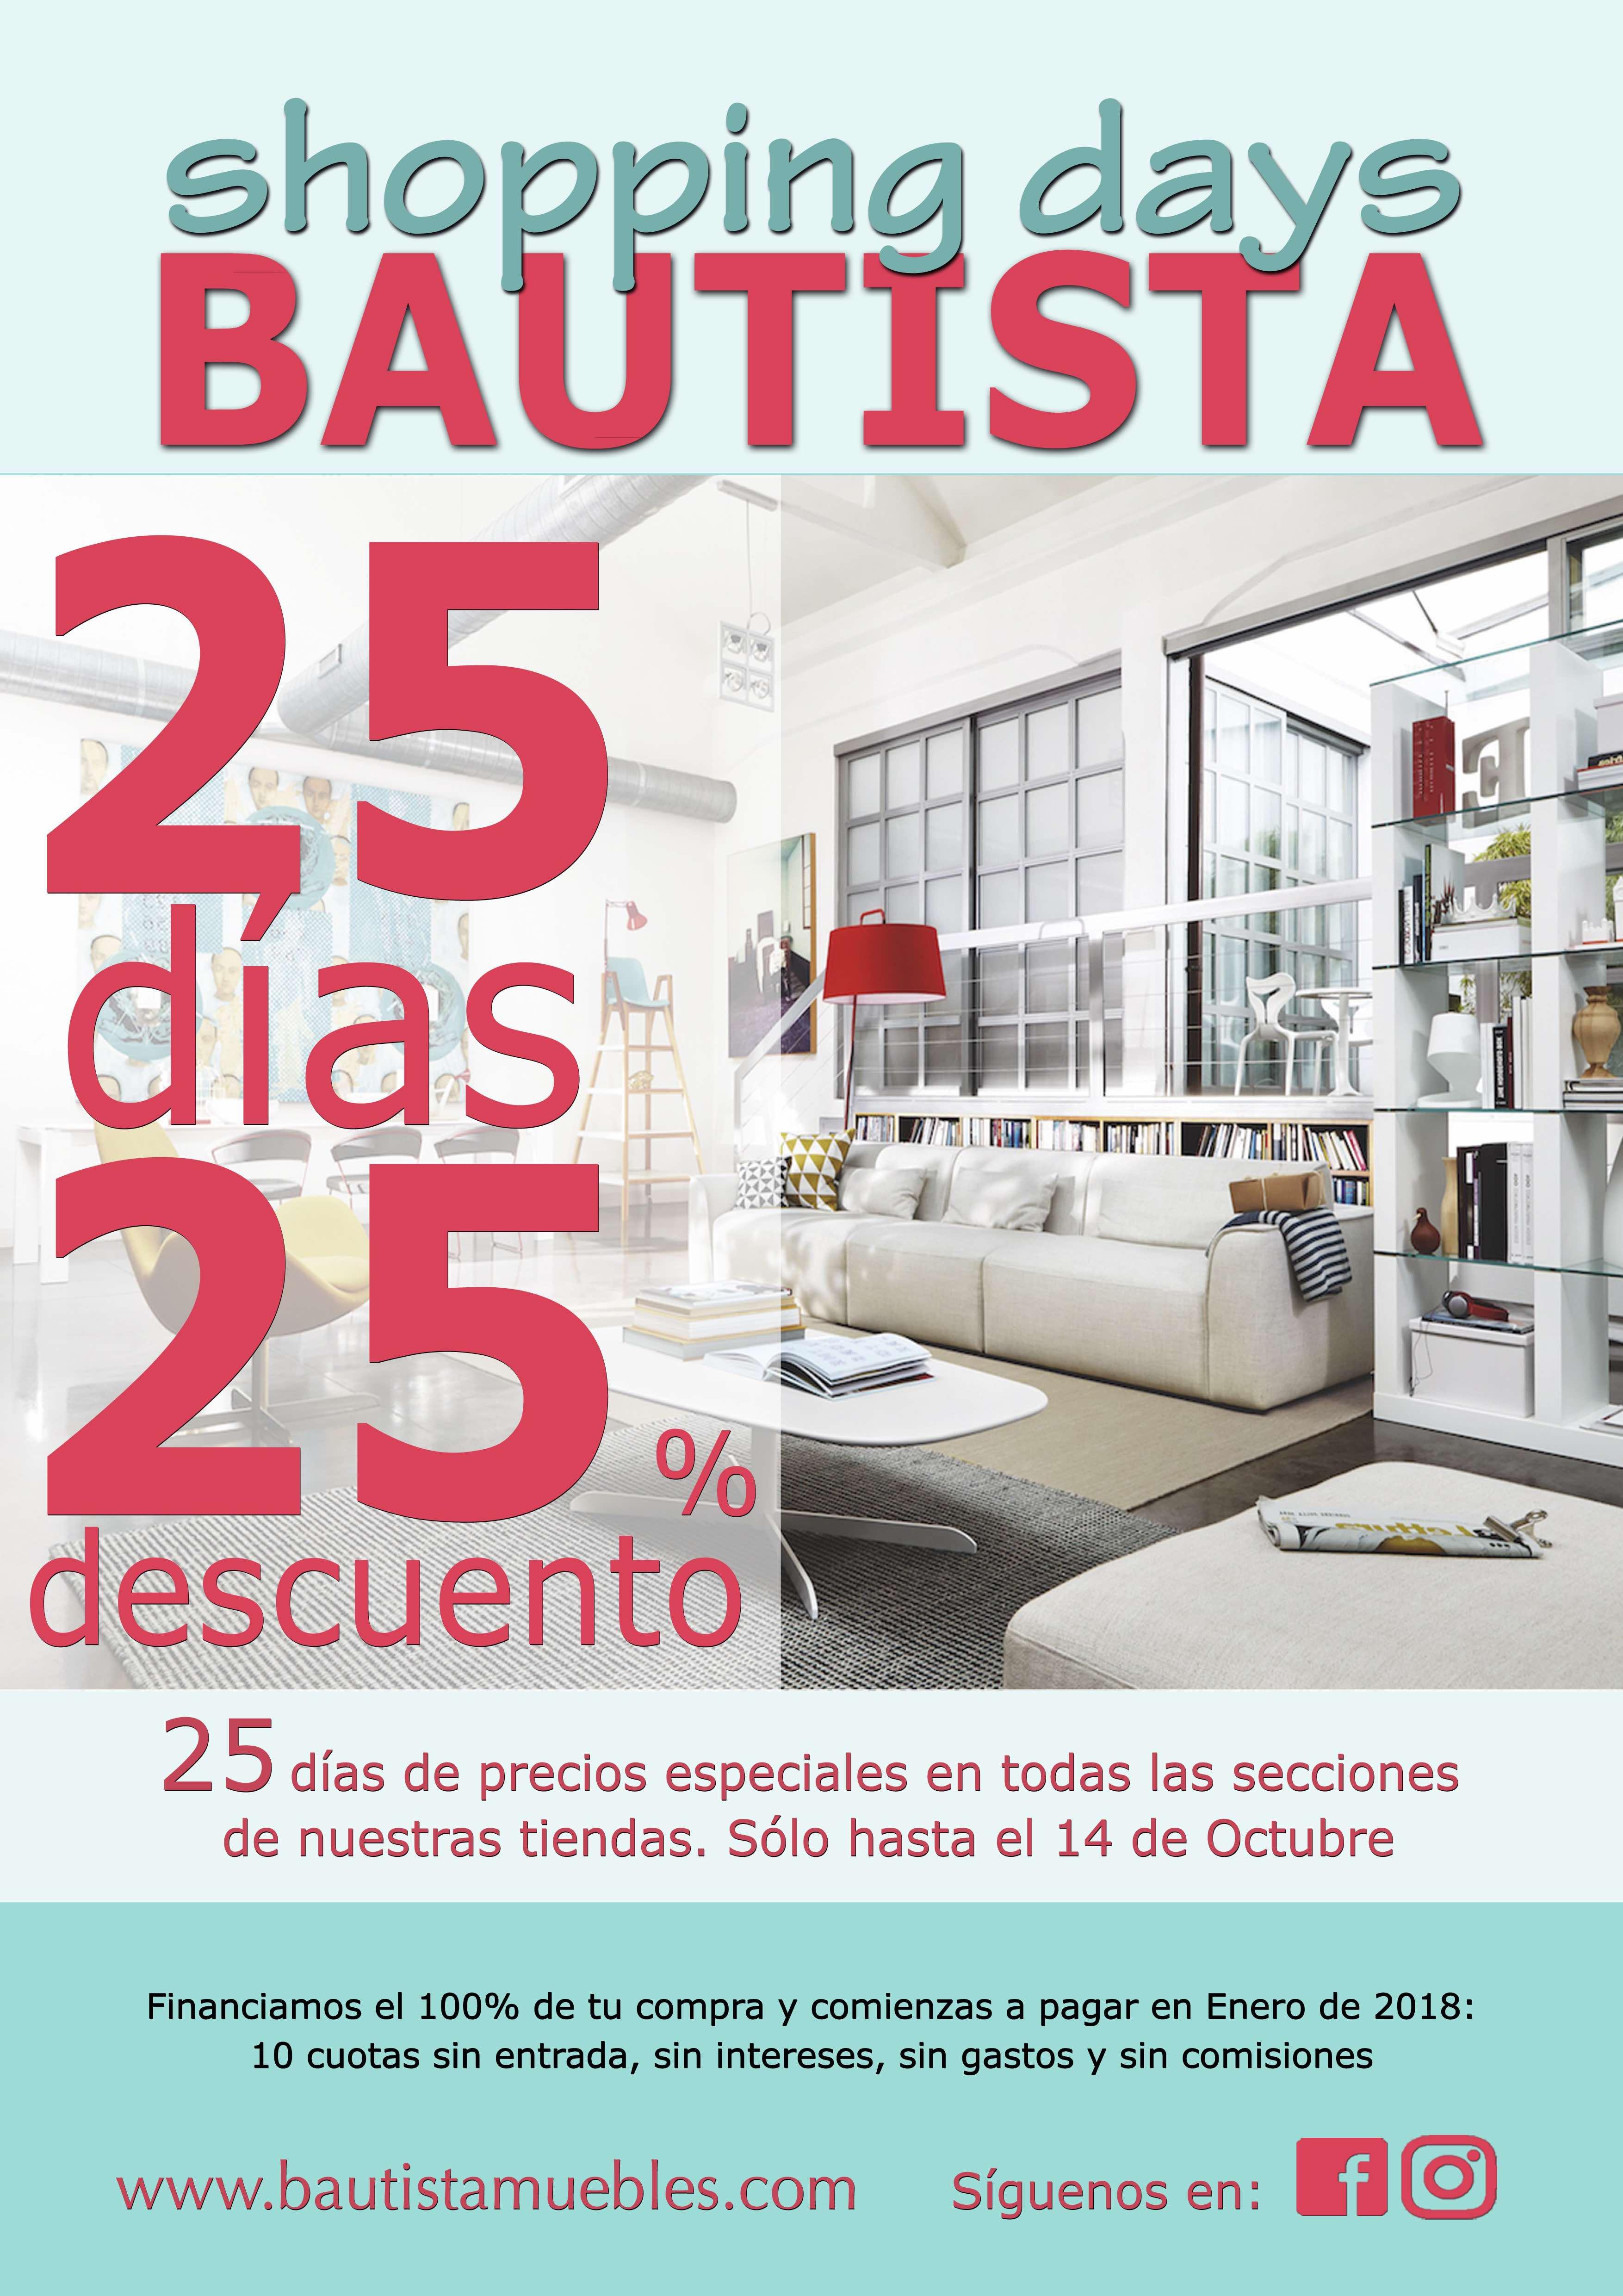 Shopping days 25 25 bautista muebles y decoraci n for Muebles llodio